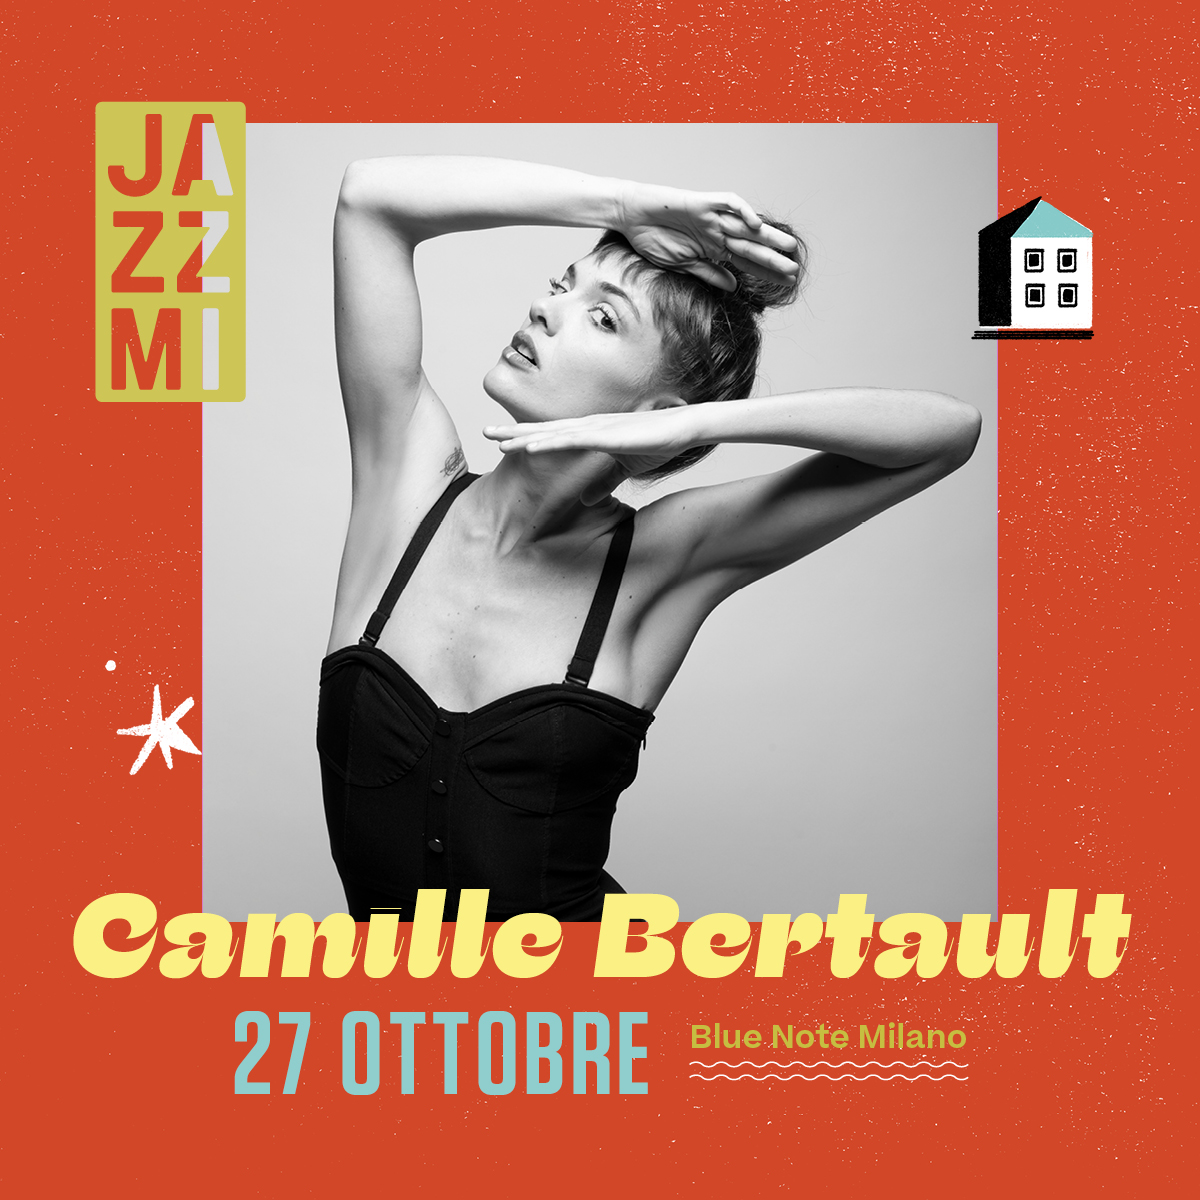 JAZZMI Camille Bertault 27/10/2021 22.30